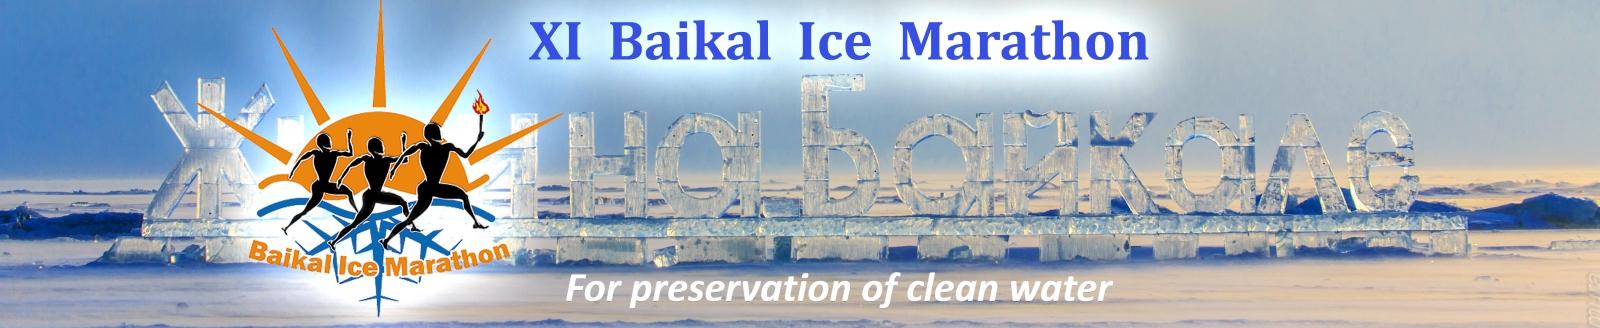 XI Baikal Ice Marathon- Story by Organizer | Baikal Ice Marathon